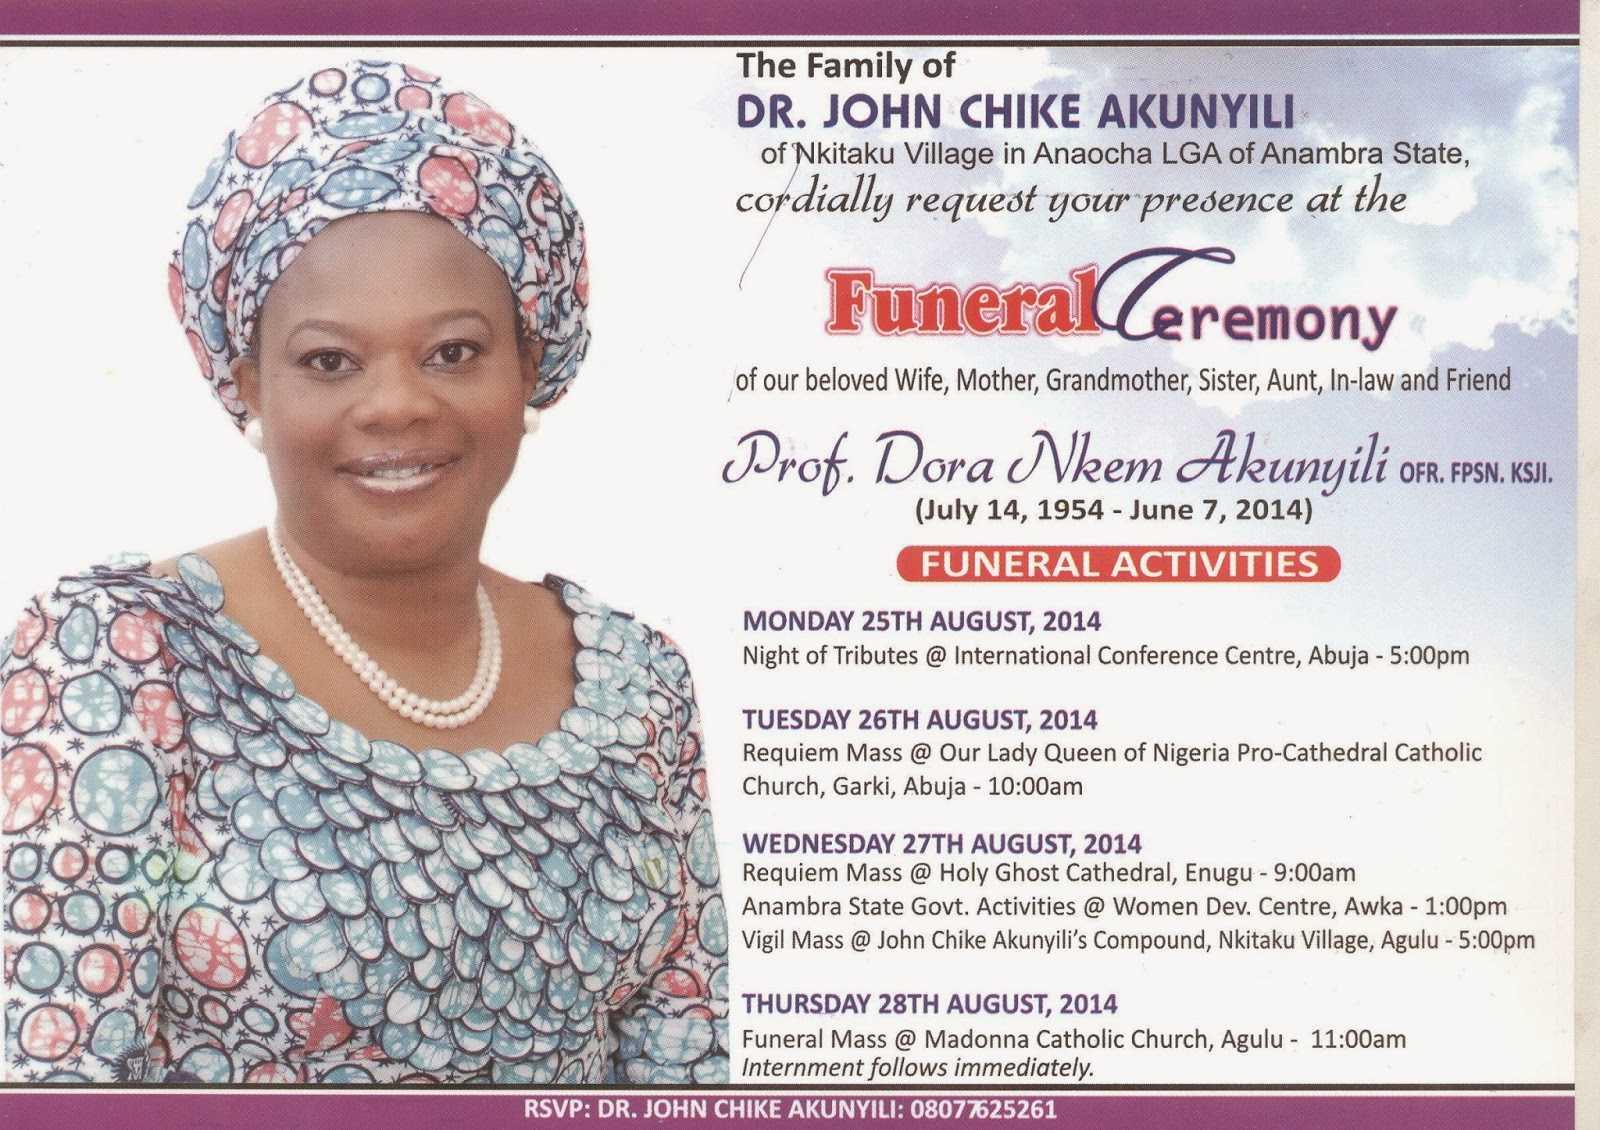 Funeral Invitation Card Of Prof Dora Nkem Akunyili Released Pertaining To Funeral Invitation Card Template